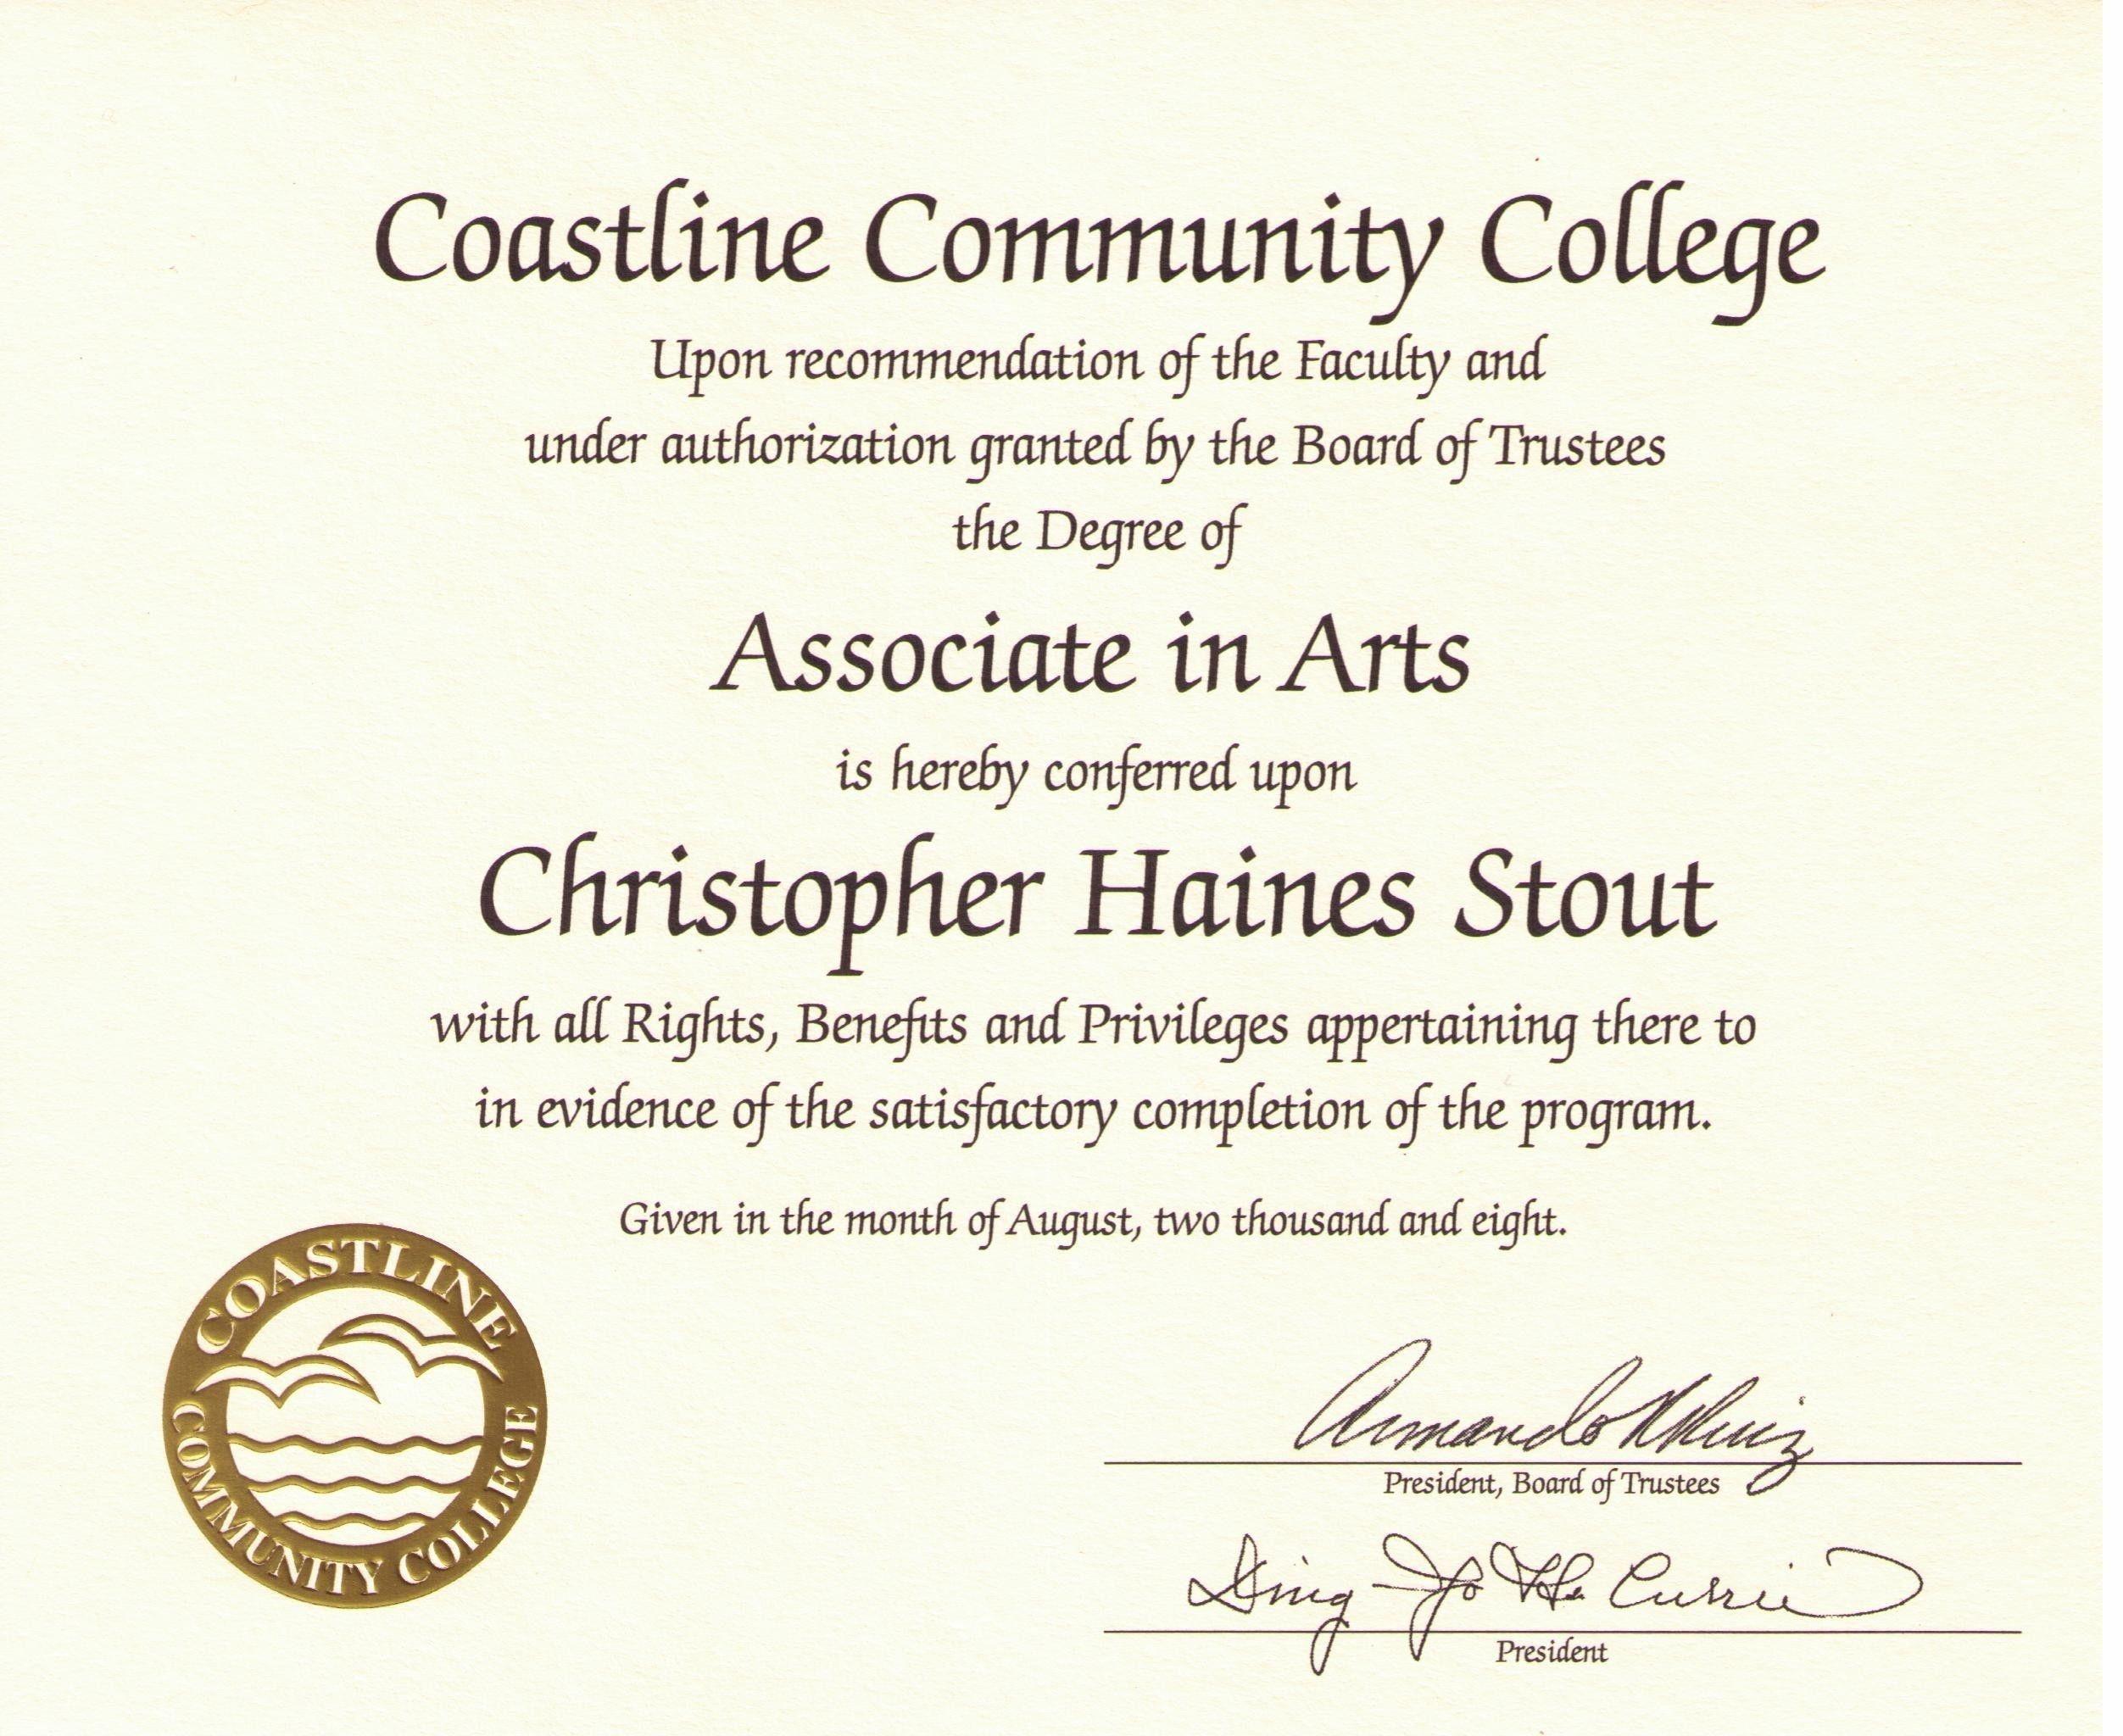 Free Printable College Diploma | Free Diploma Templates | In1 - Free Printable College Degrees